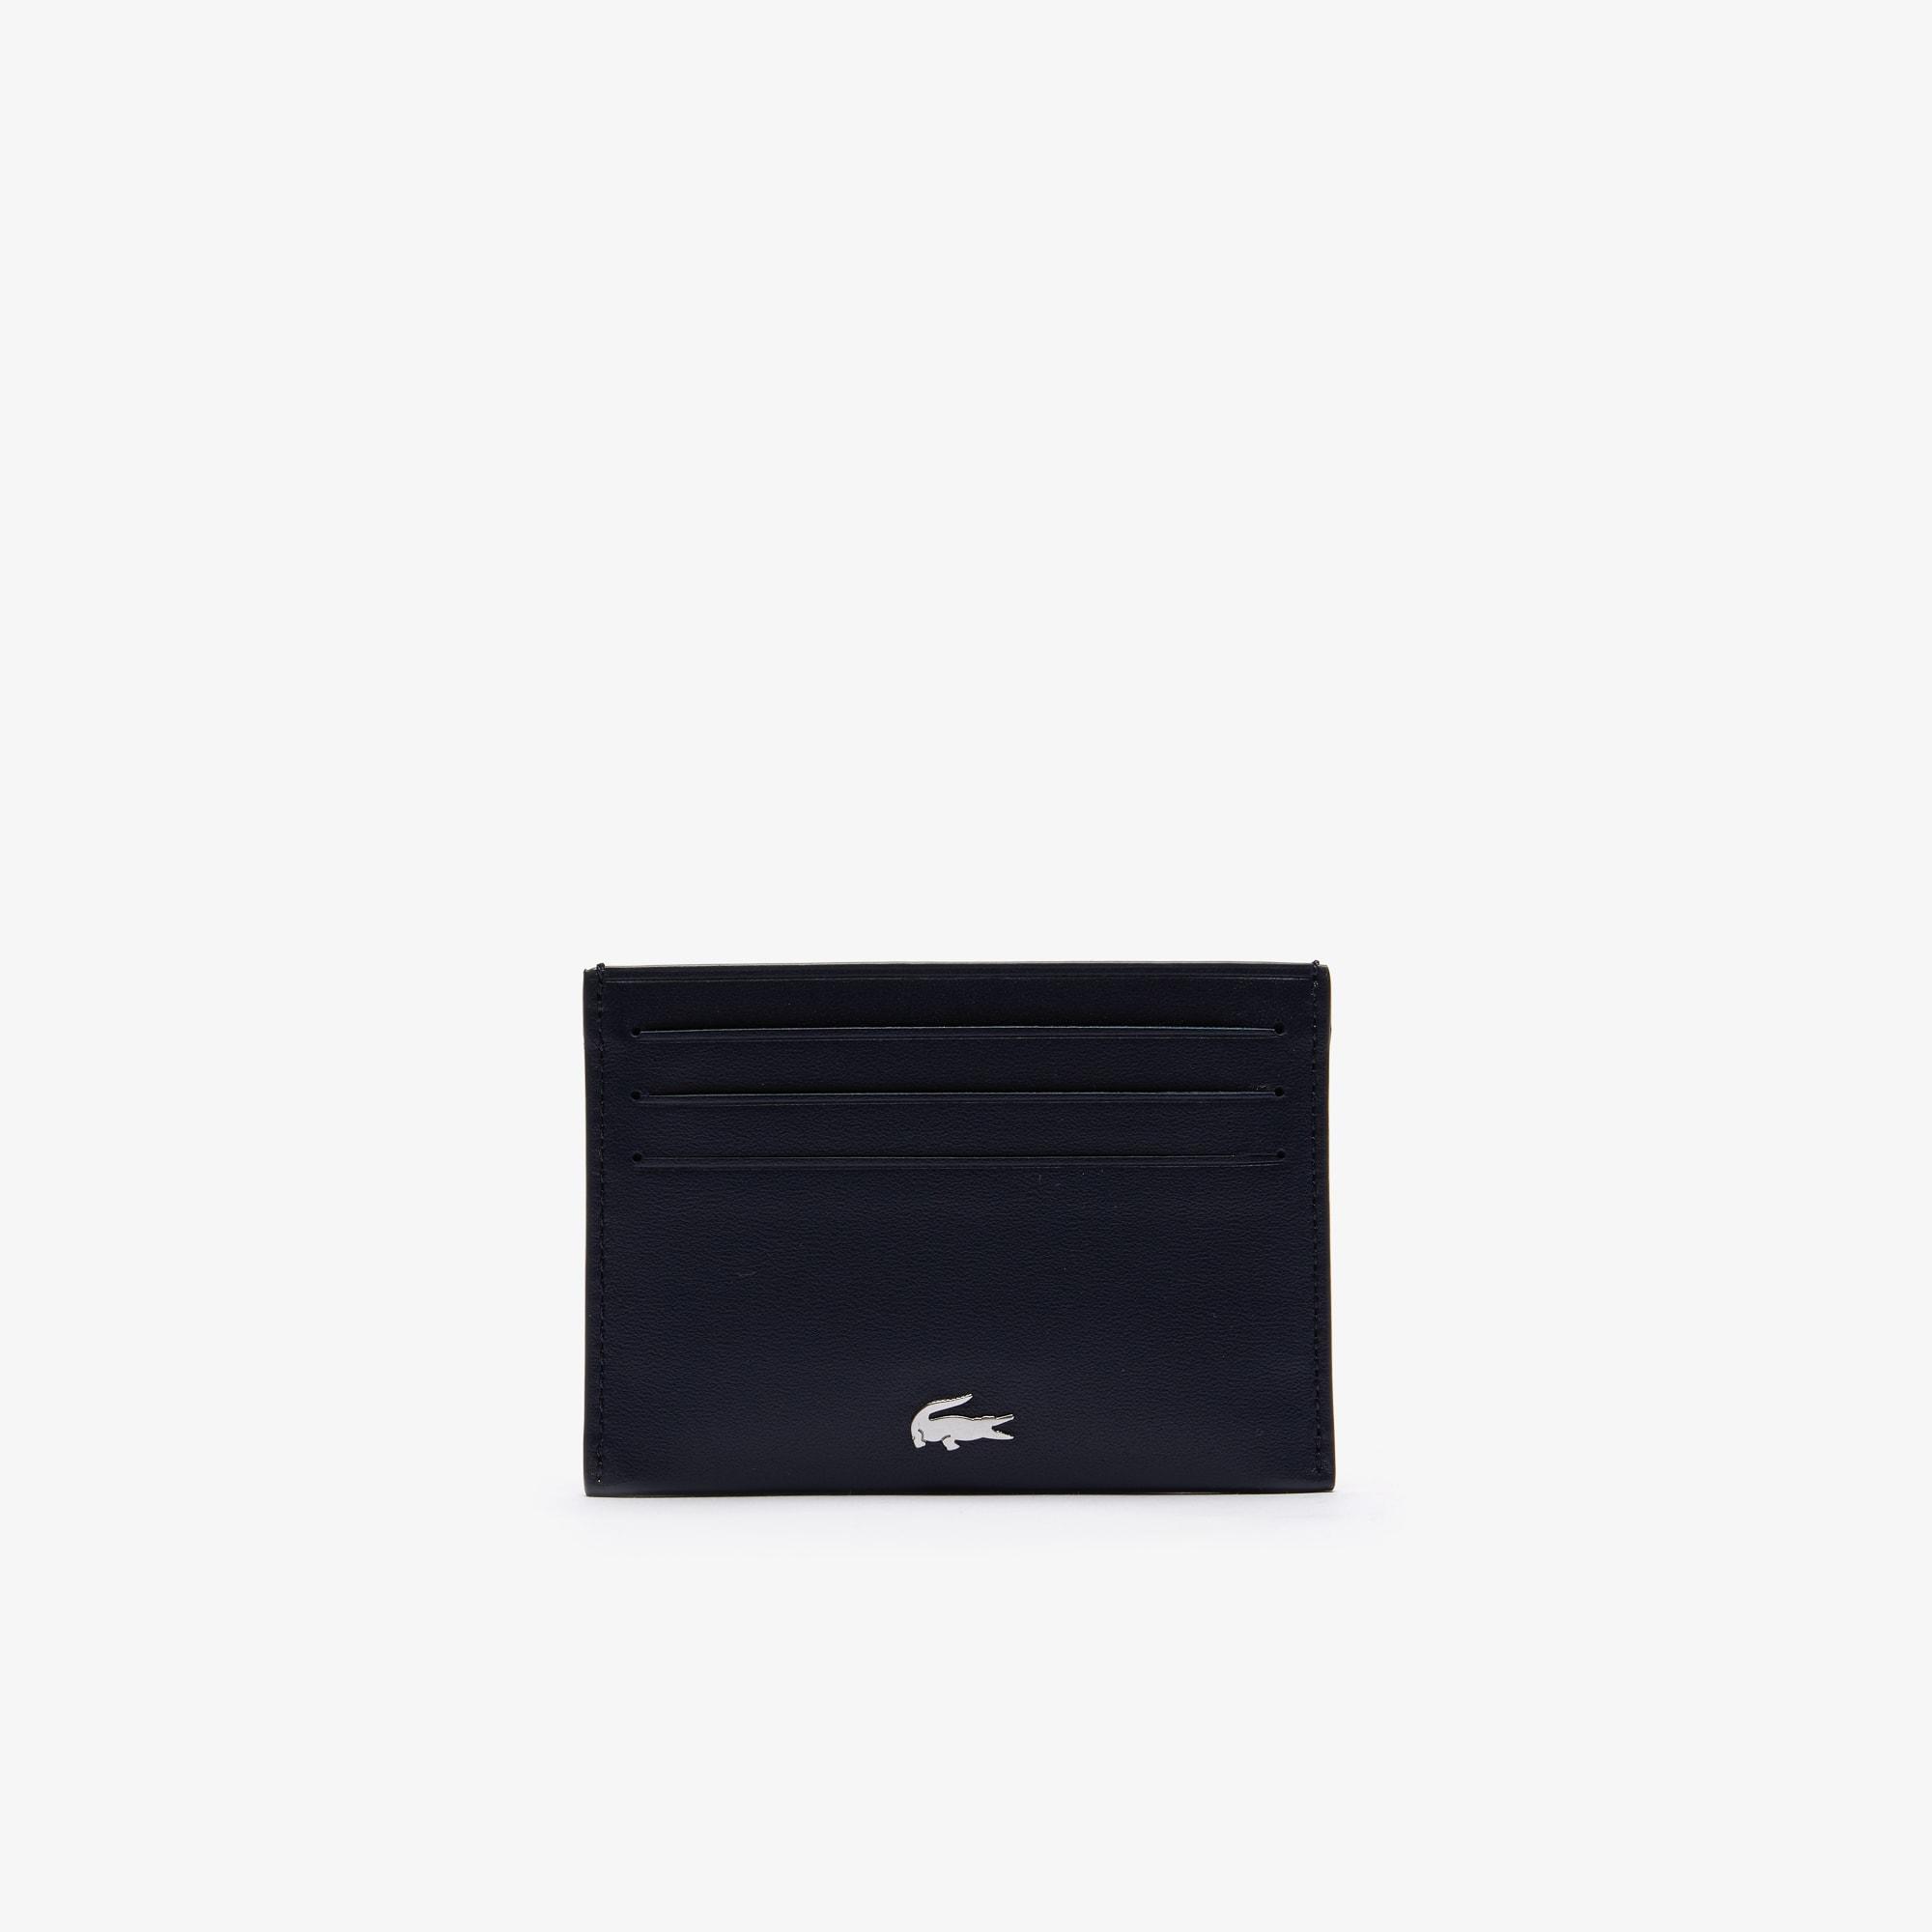 FG-Kreditkartenetui aus Leder